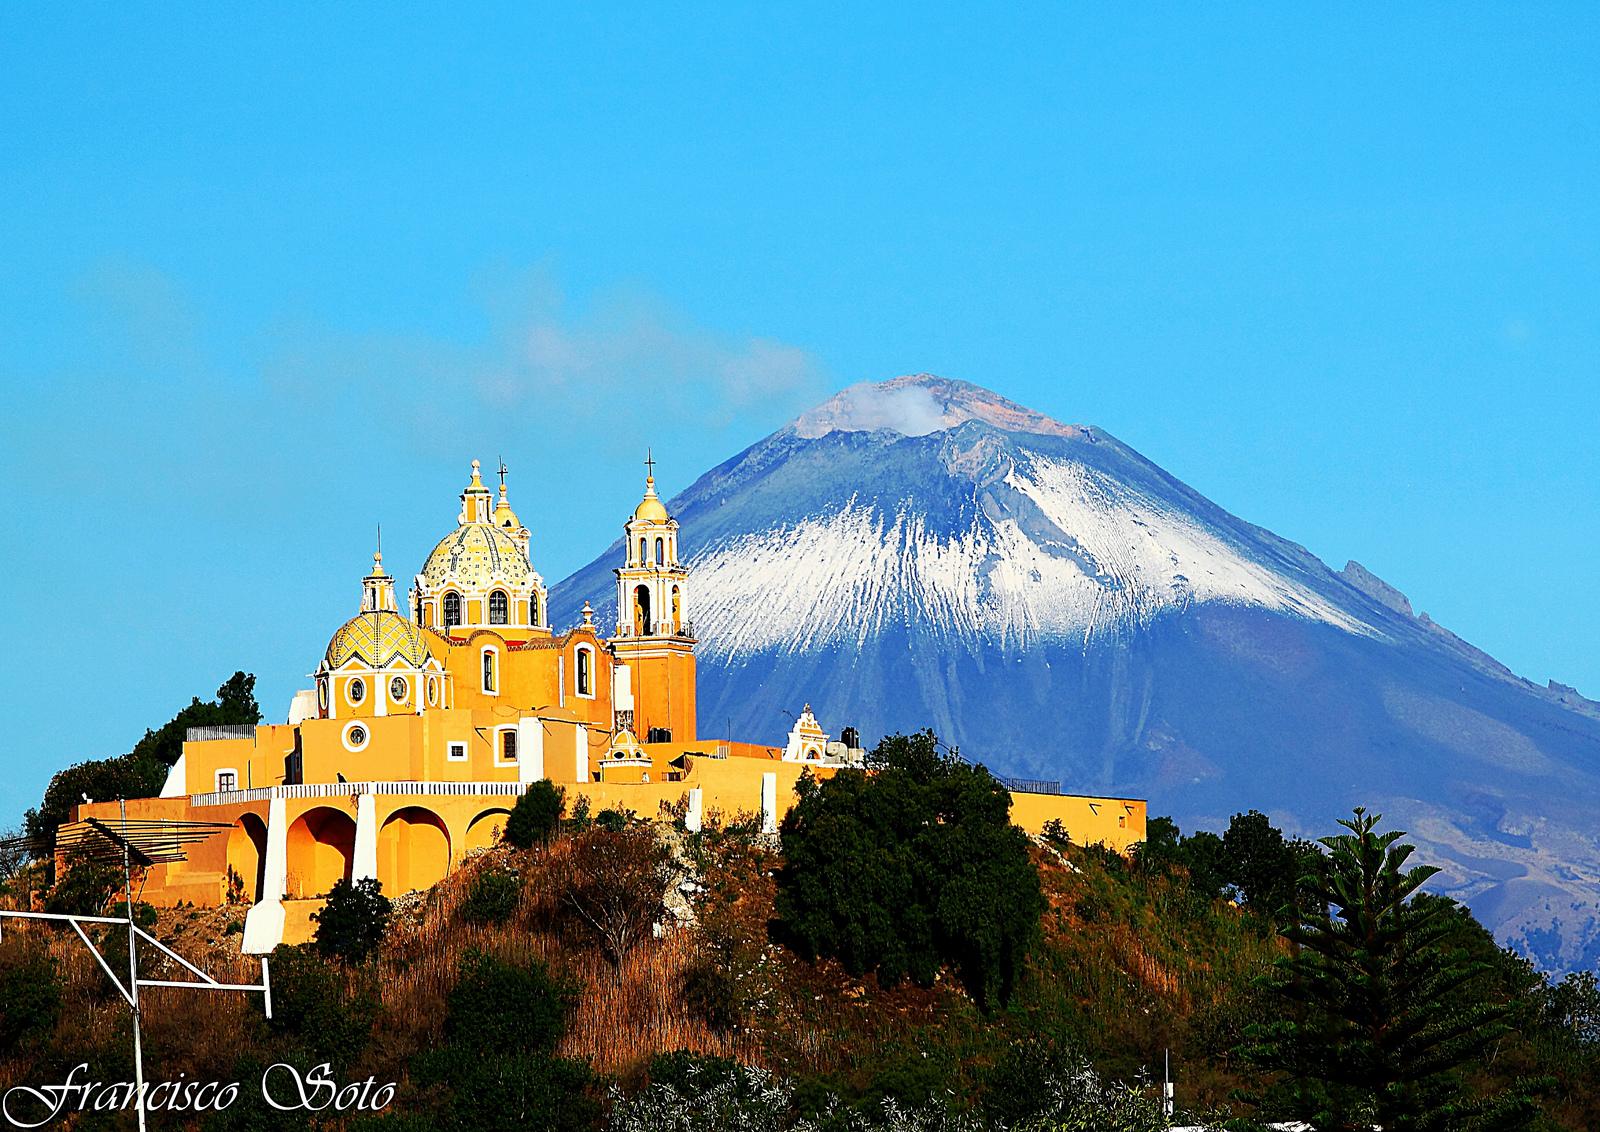 Cholula: El Popocatépetl and the church of La Señora de los Remedios, built on top of the largest pyramid in Mexico*